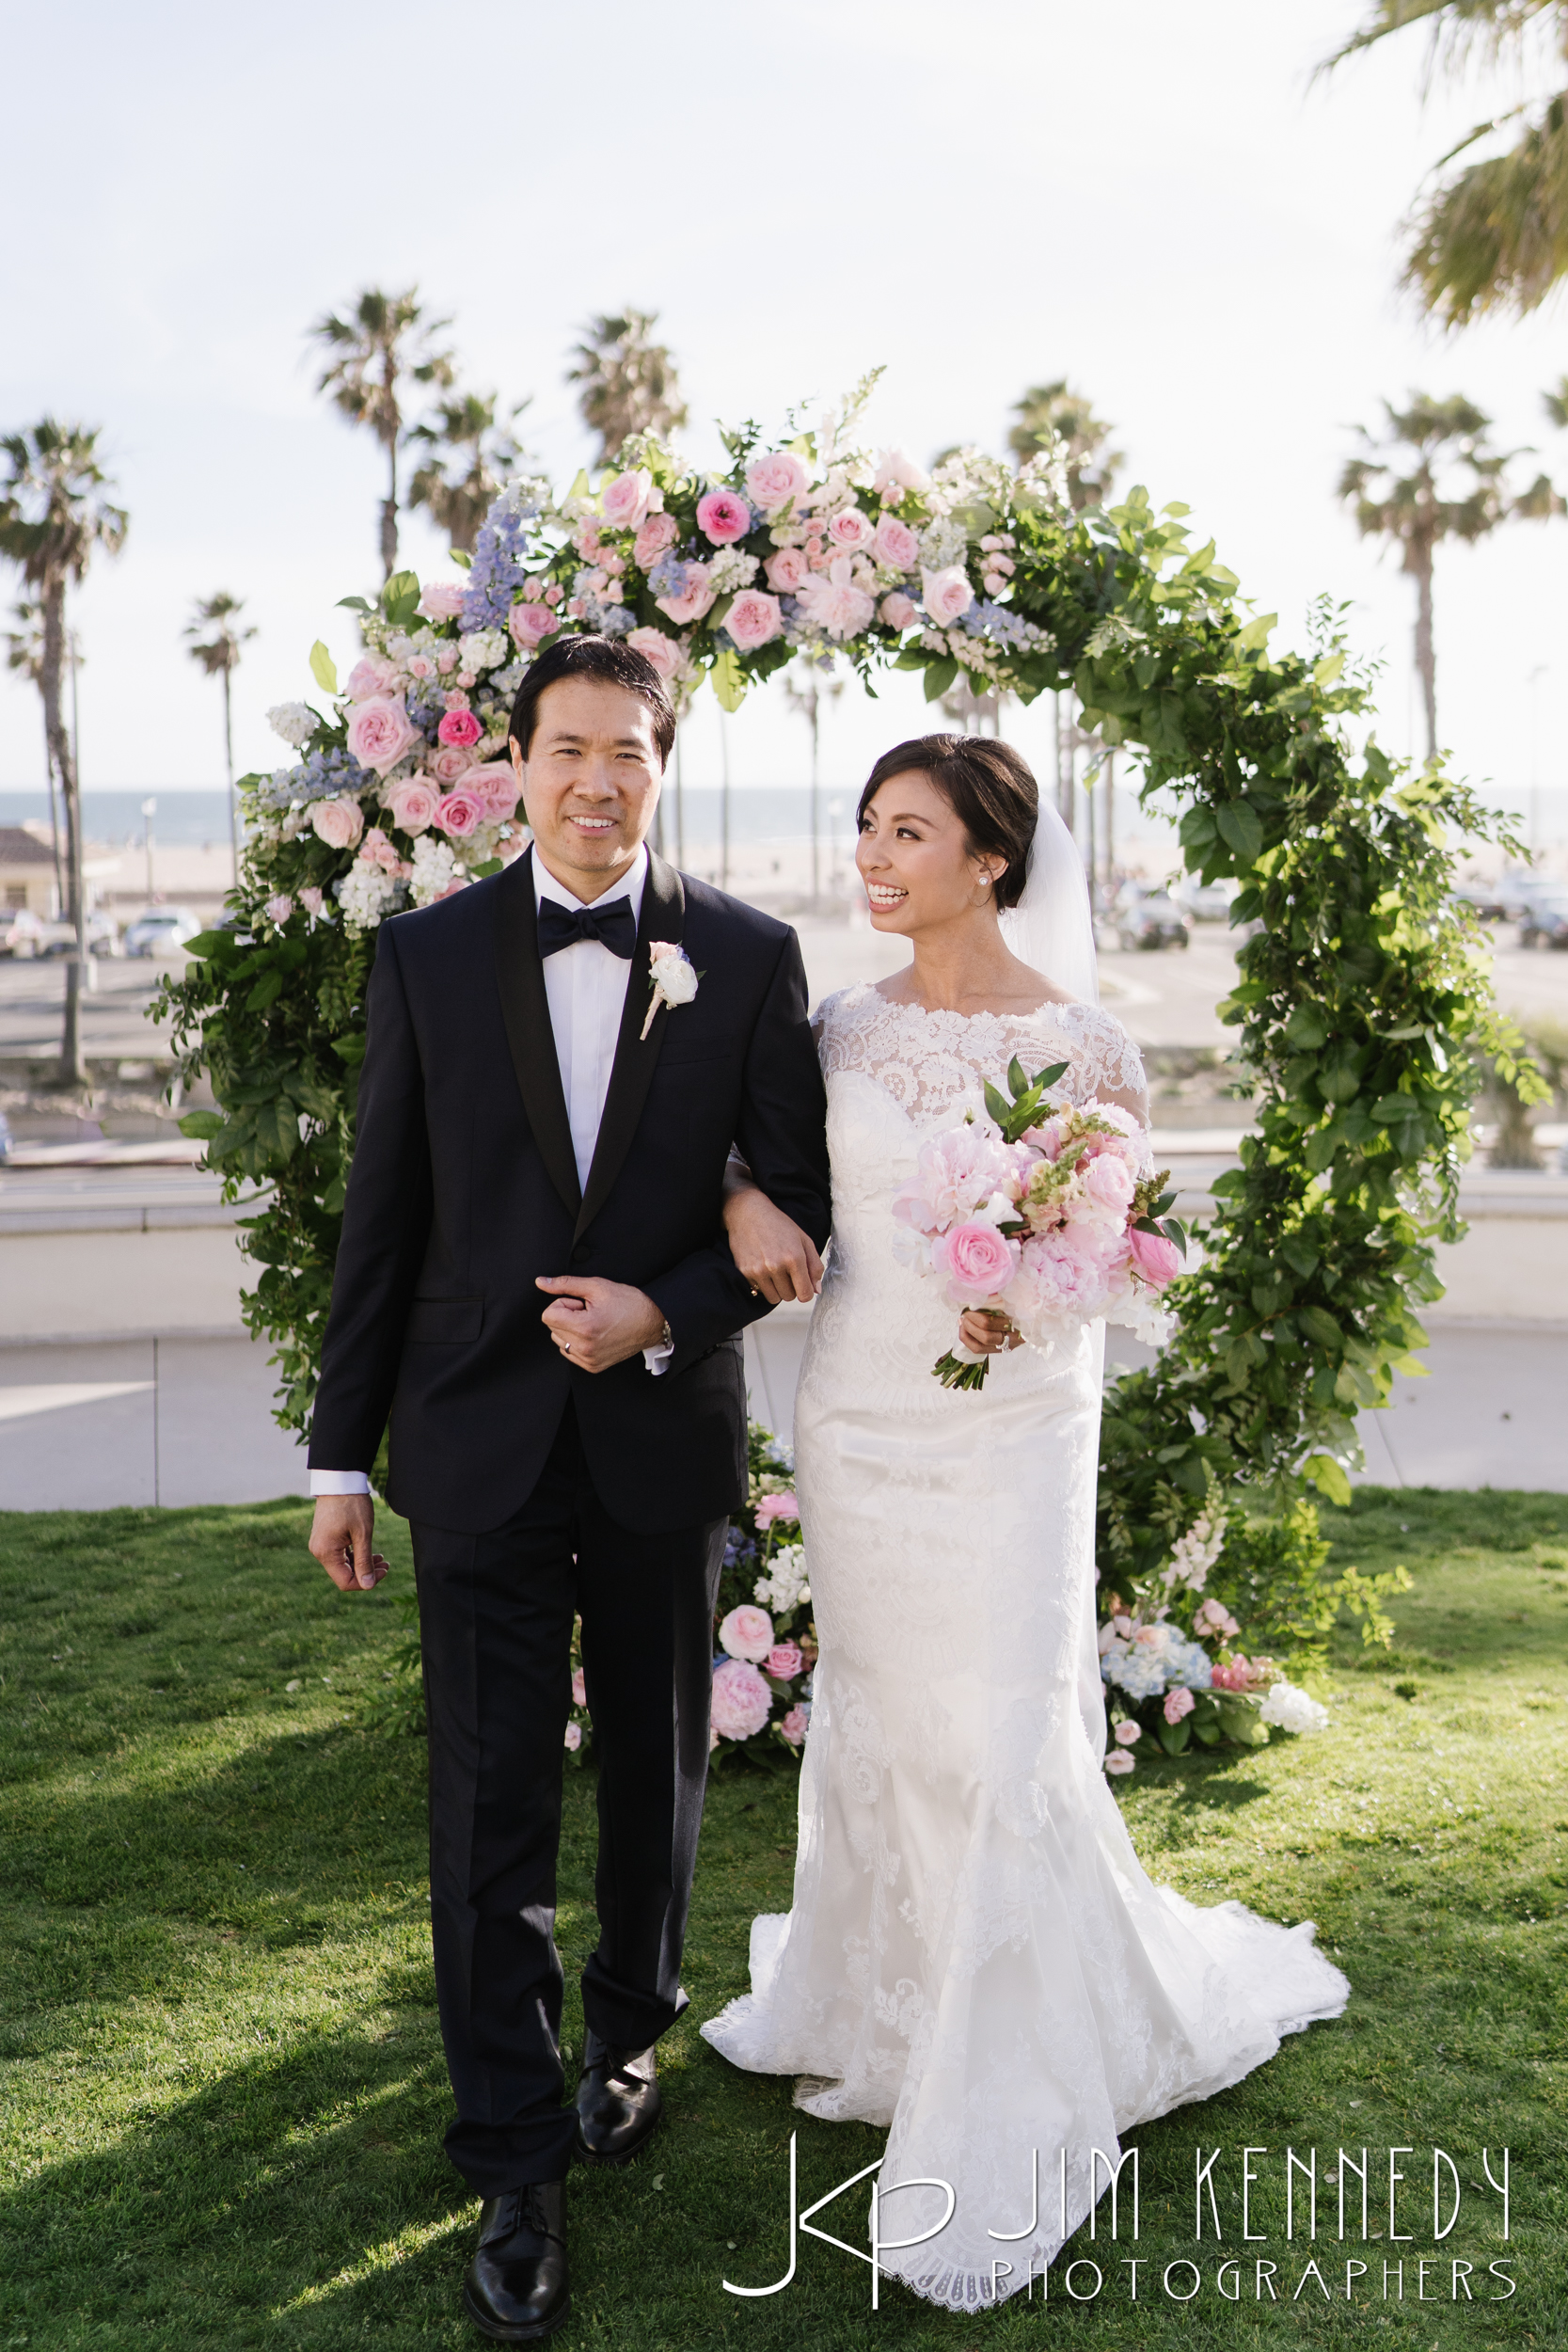 hyatt_huntington_beach_wedding-5069.jpg